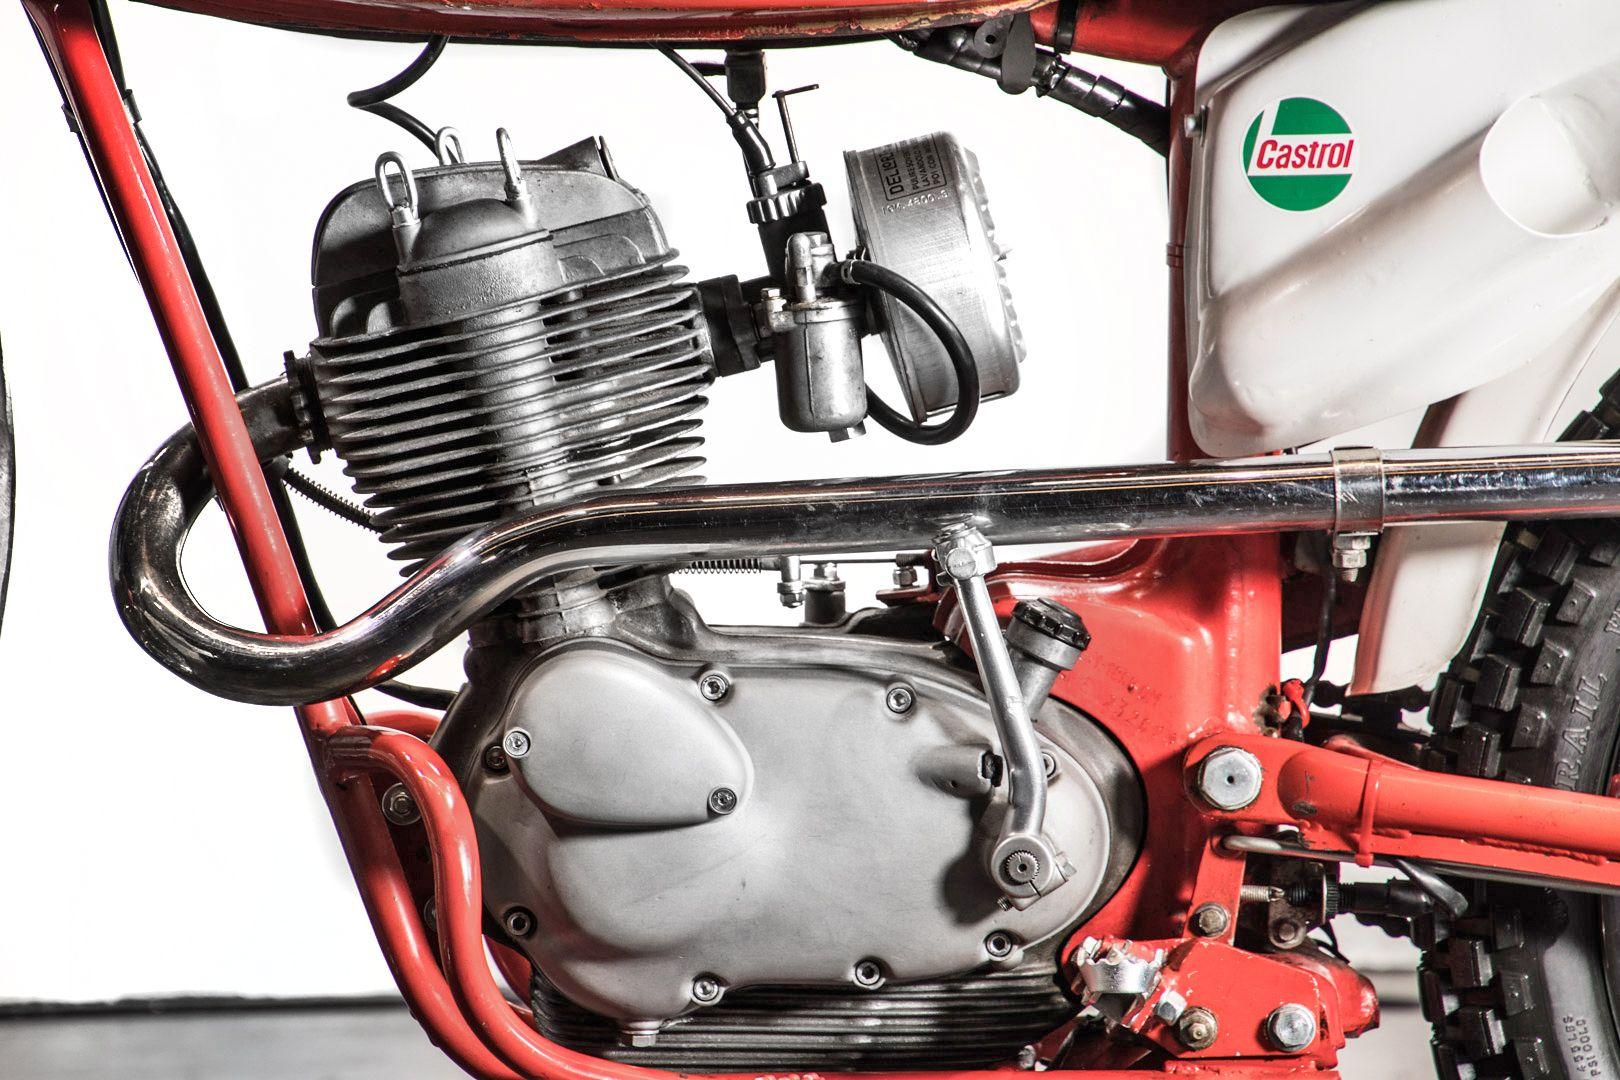 1959 Moto Morini Corsaro 125 37759